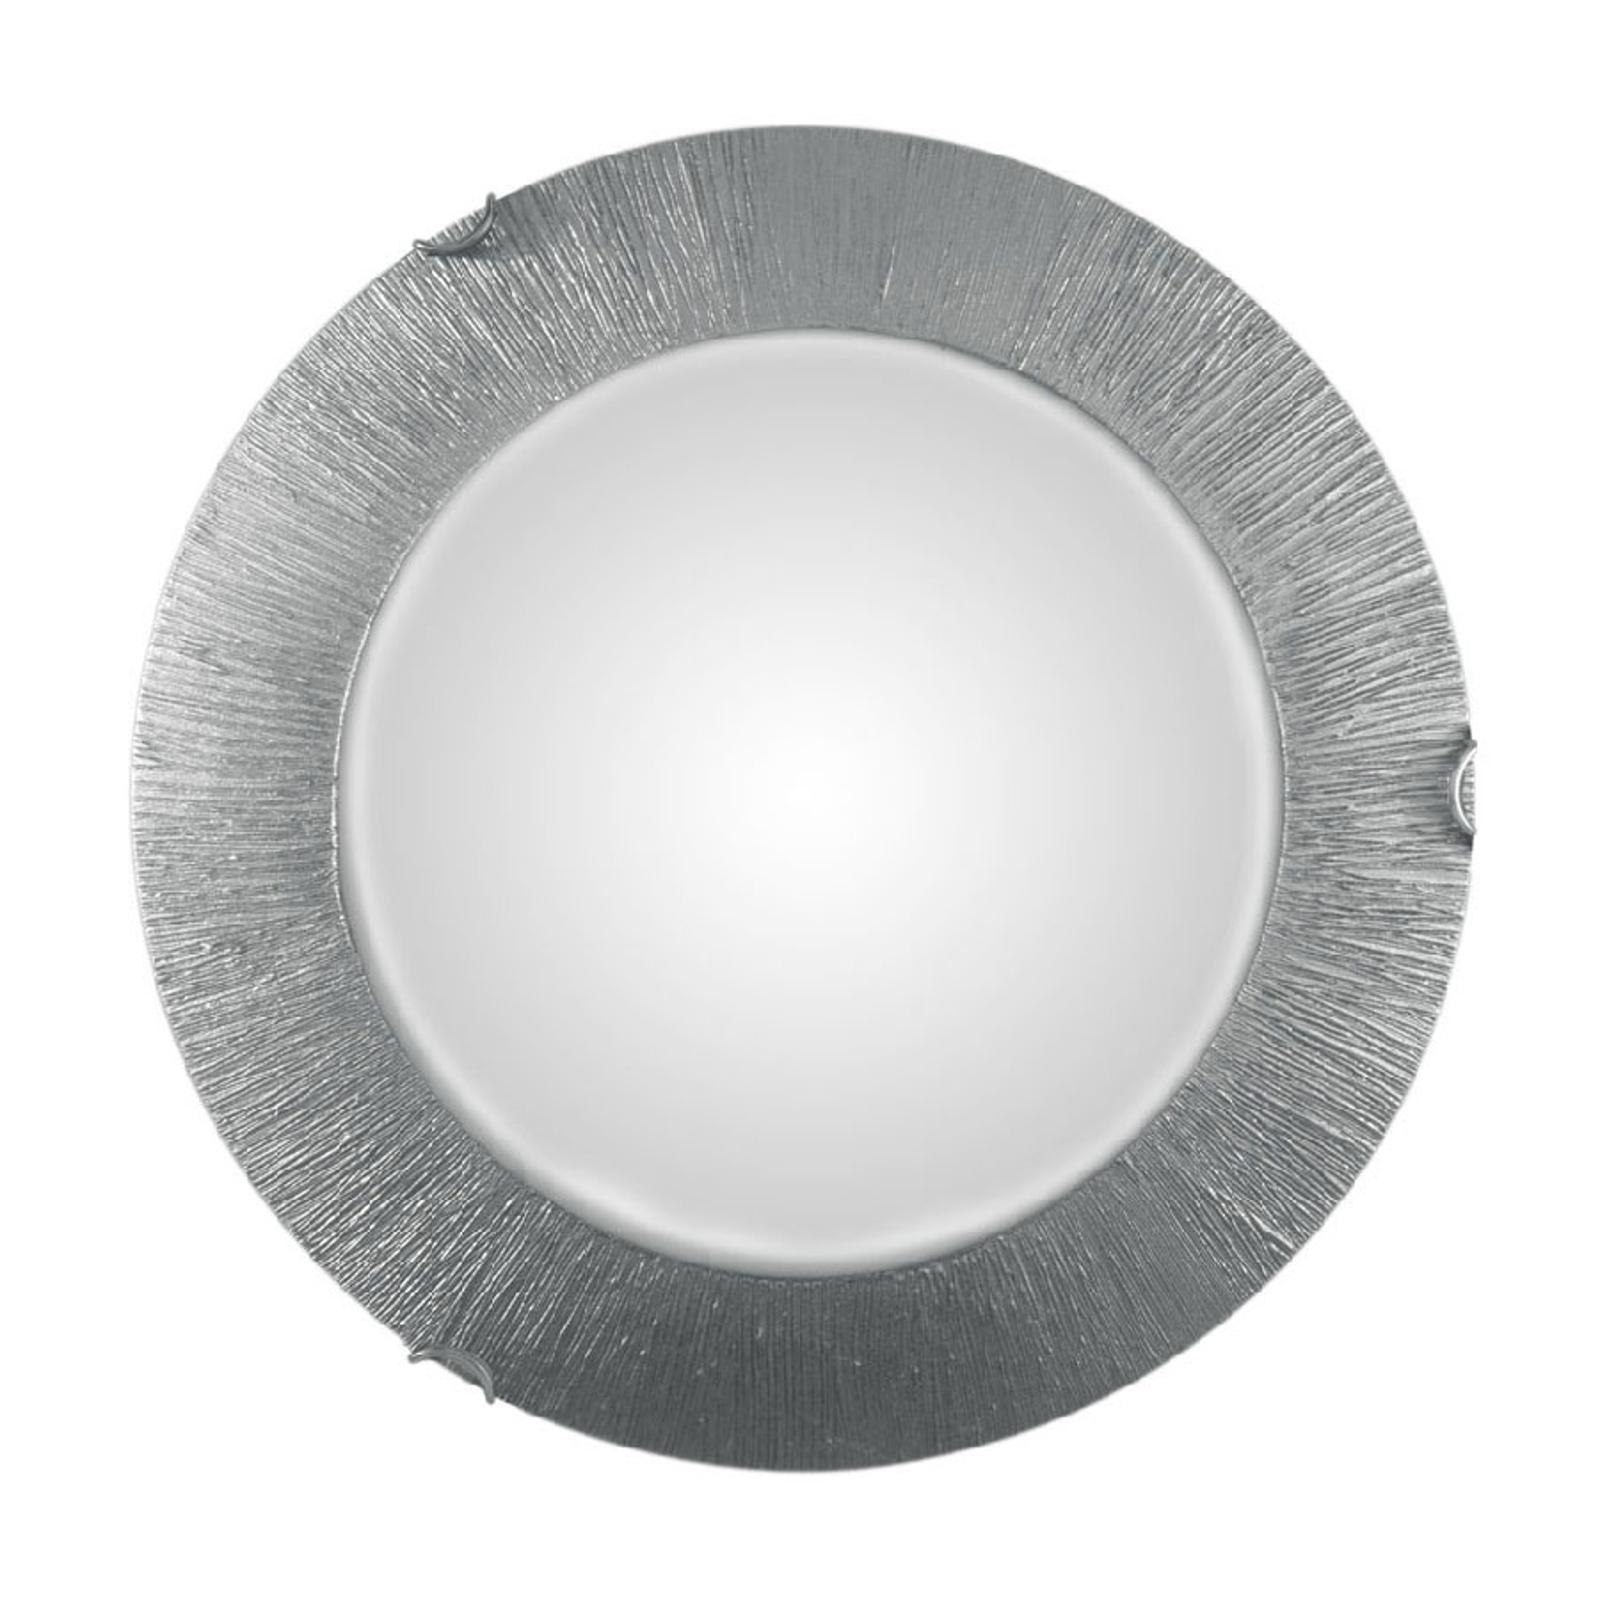 Wandlampe Moon Sun, silber, Ø 40 cm